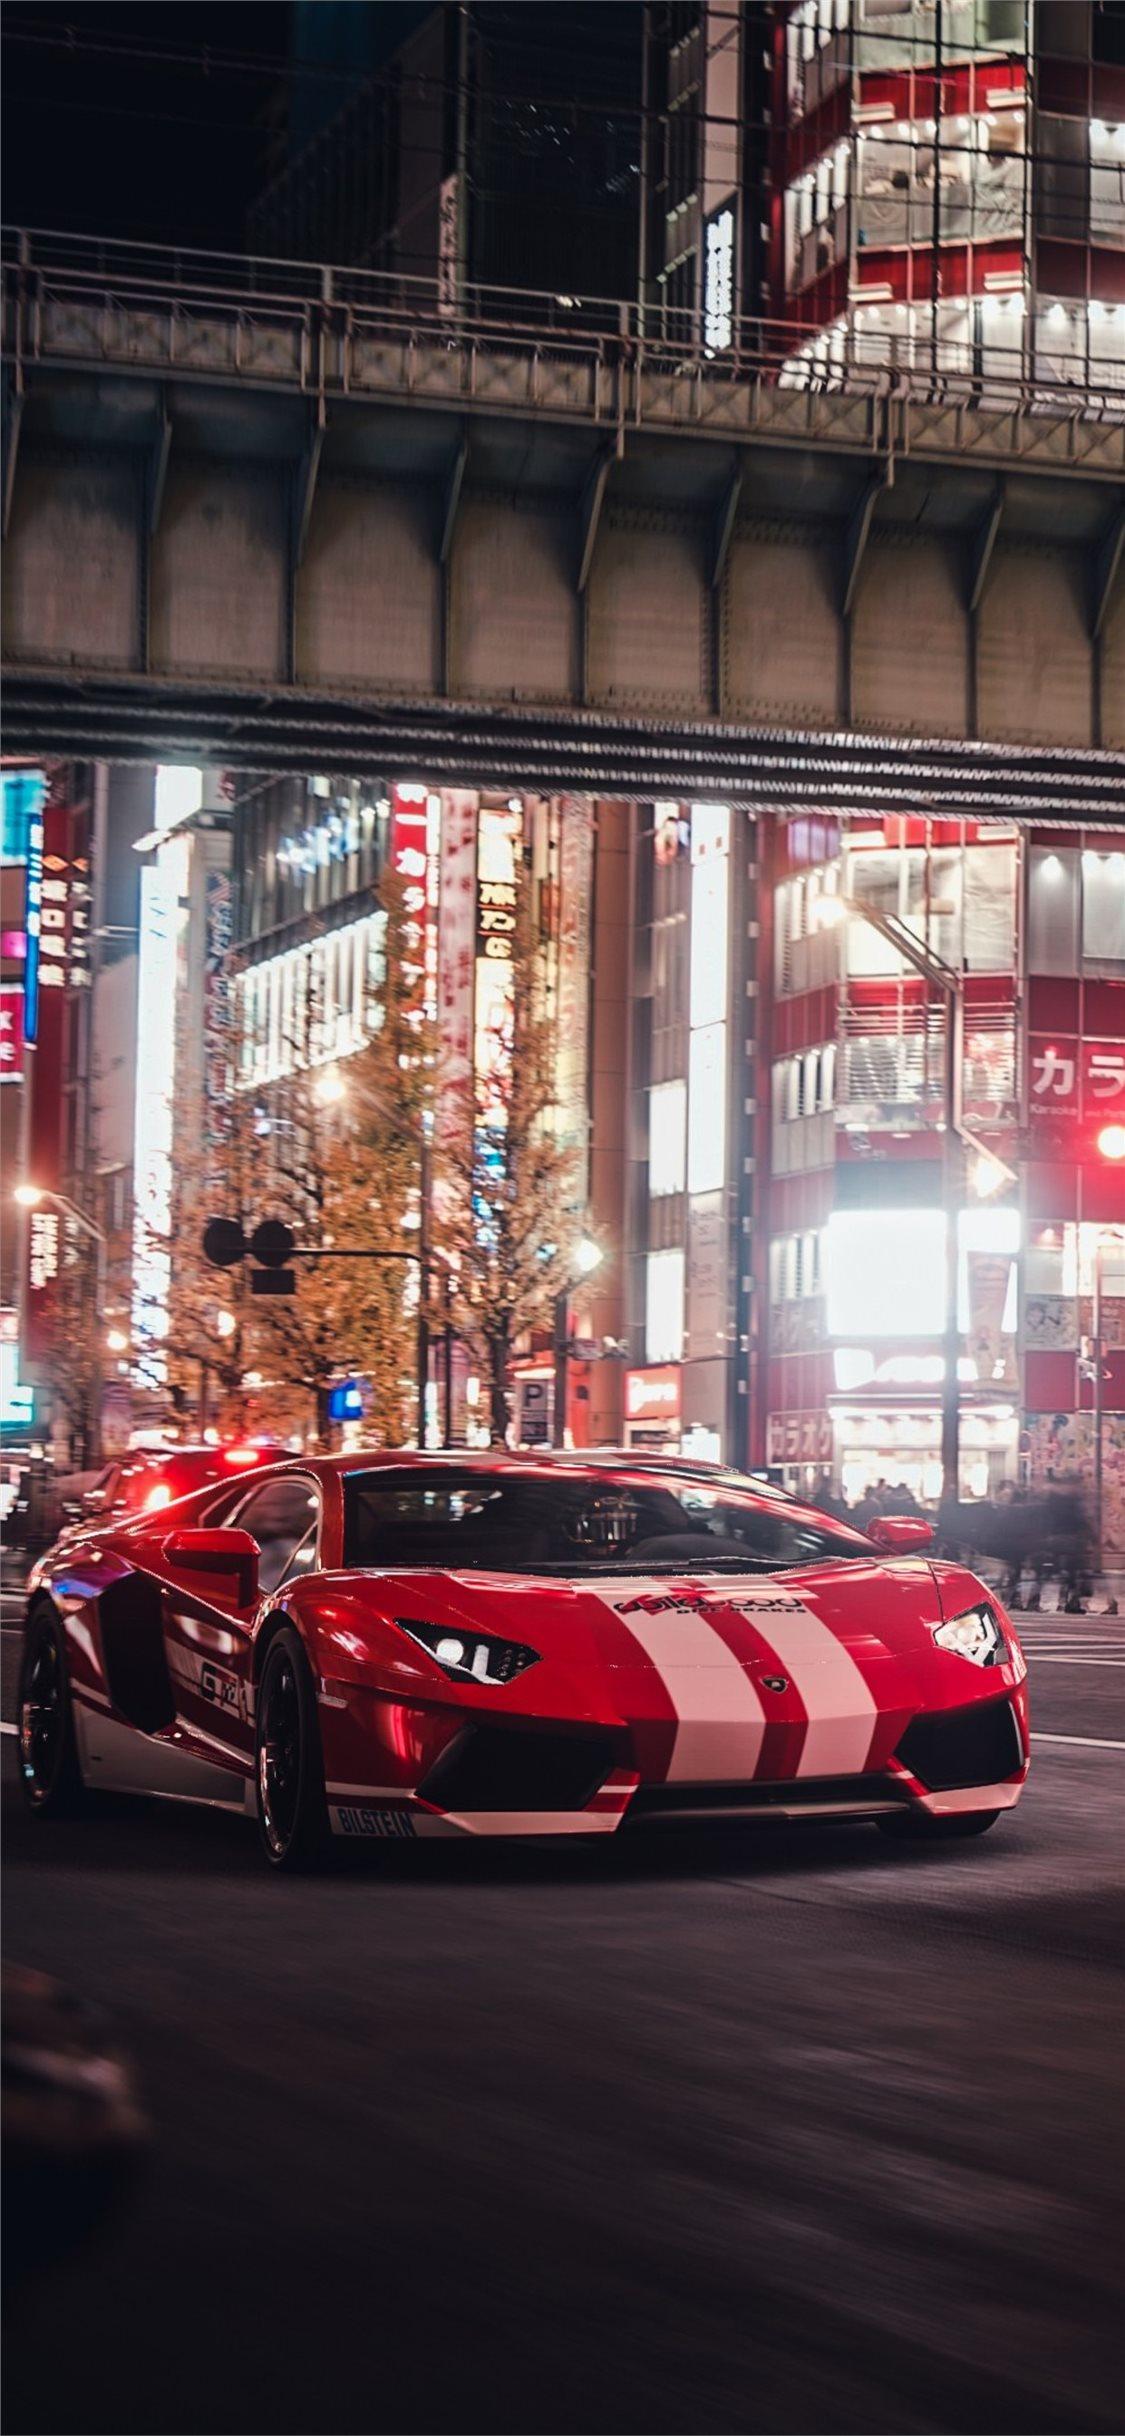 Lamborghini And Mclaren F1 Gran Turismo Iphone X Wallpapers Free Download